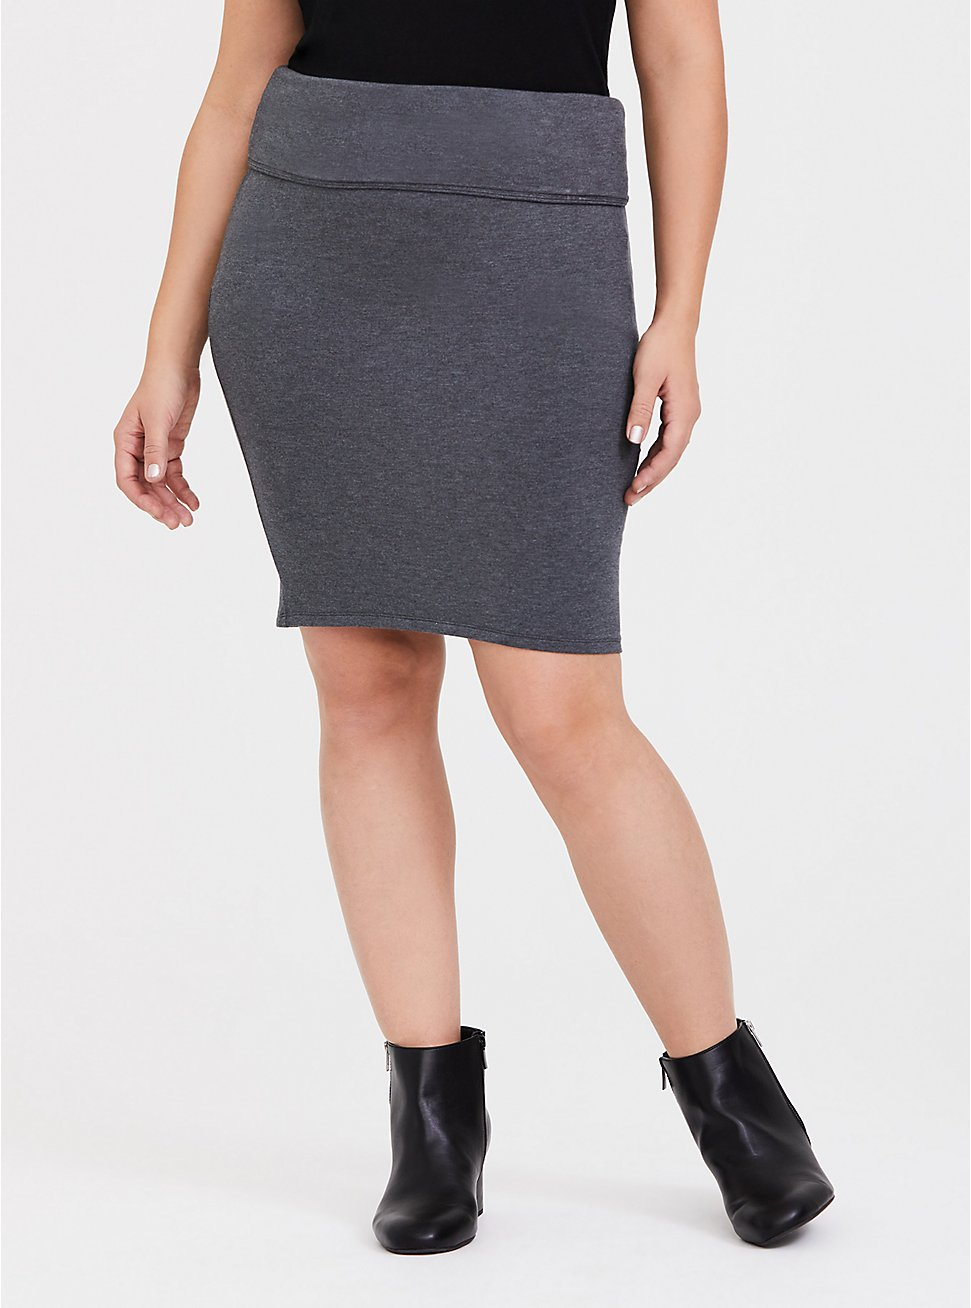 Charcoal Grey Fleece Foldover Mini Skirt, CHARCOAL  GREY, hi-res